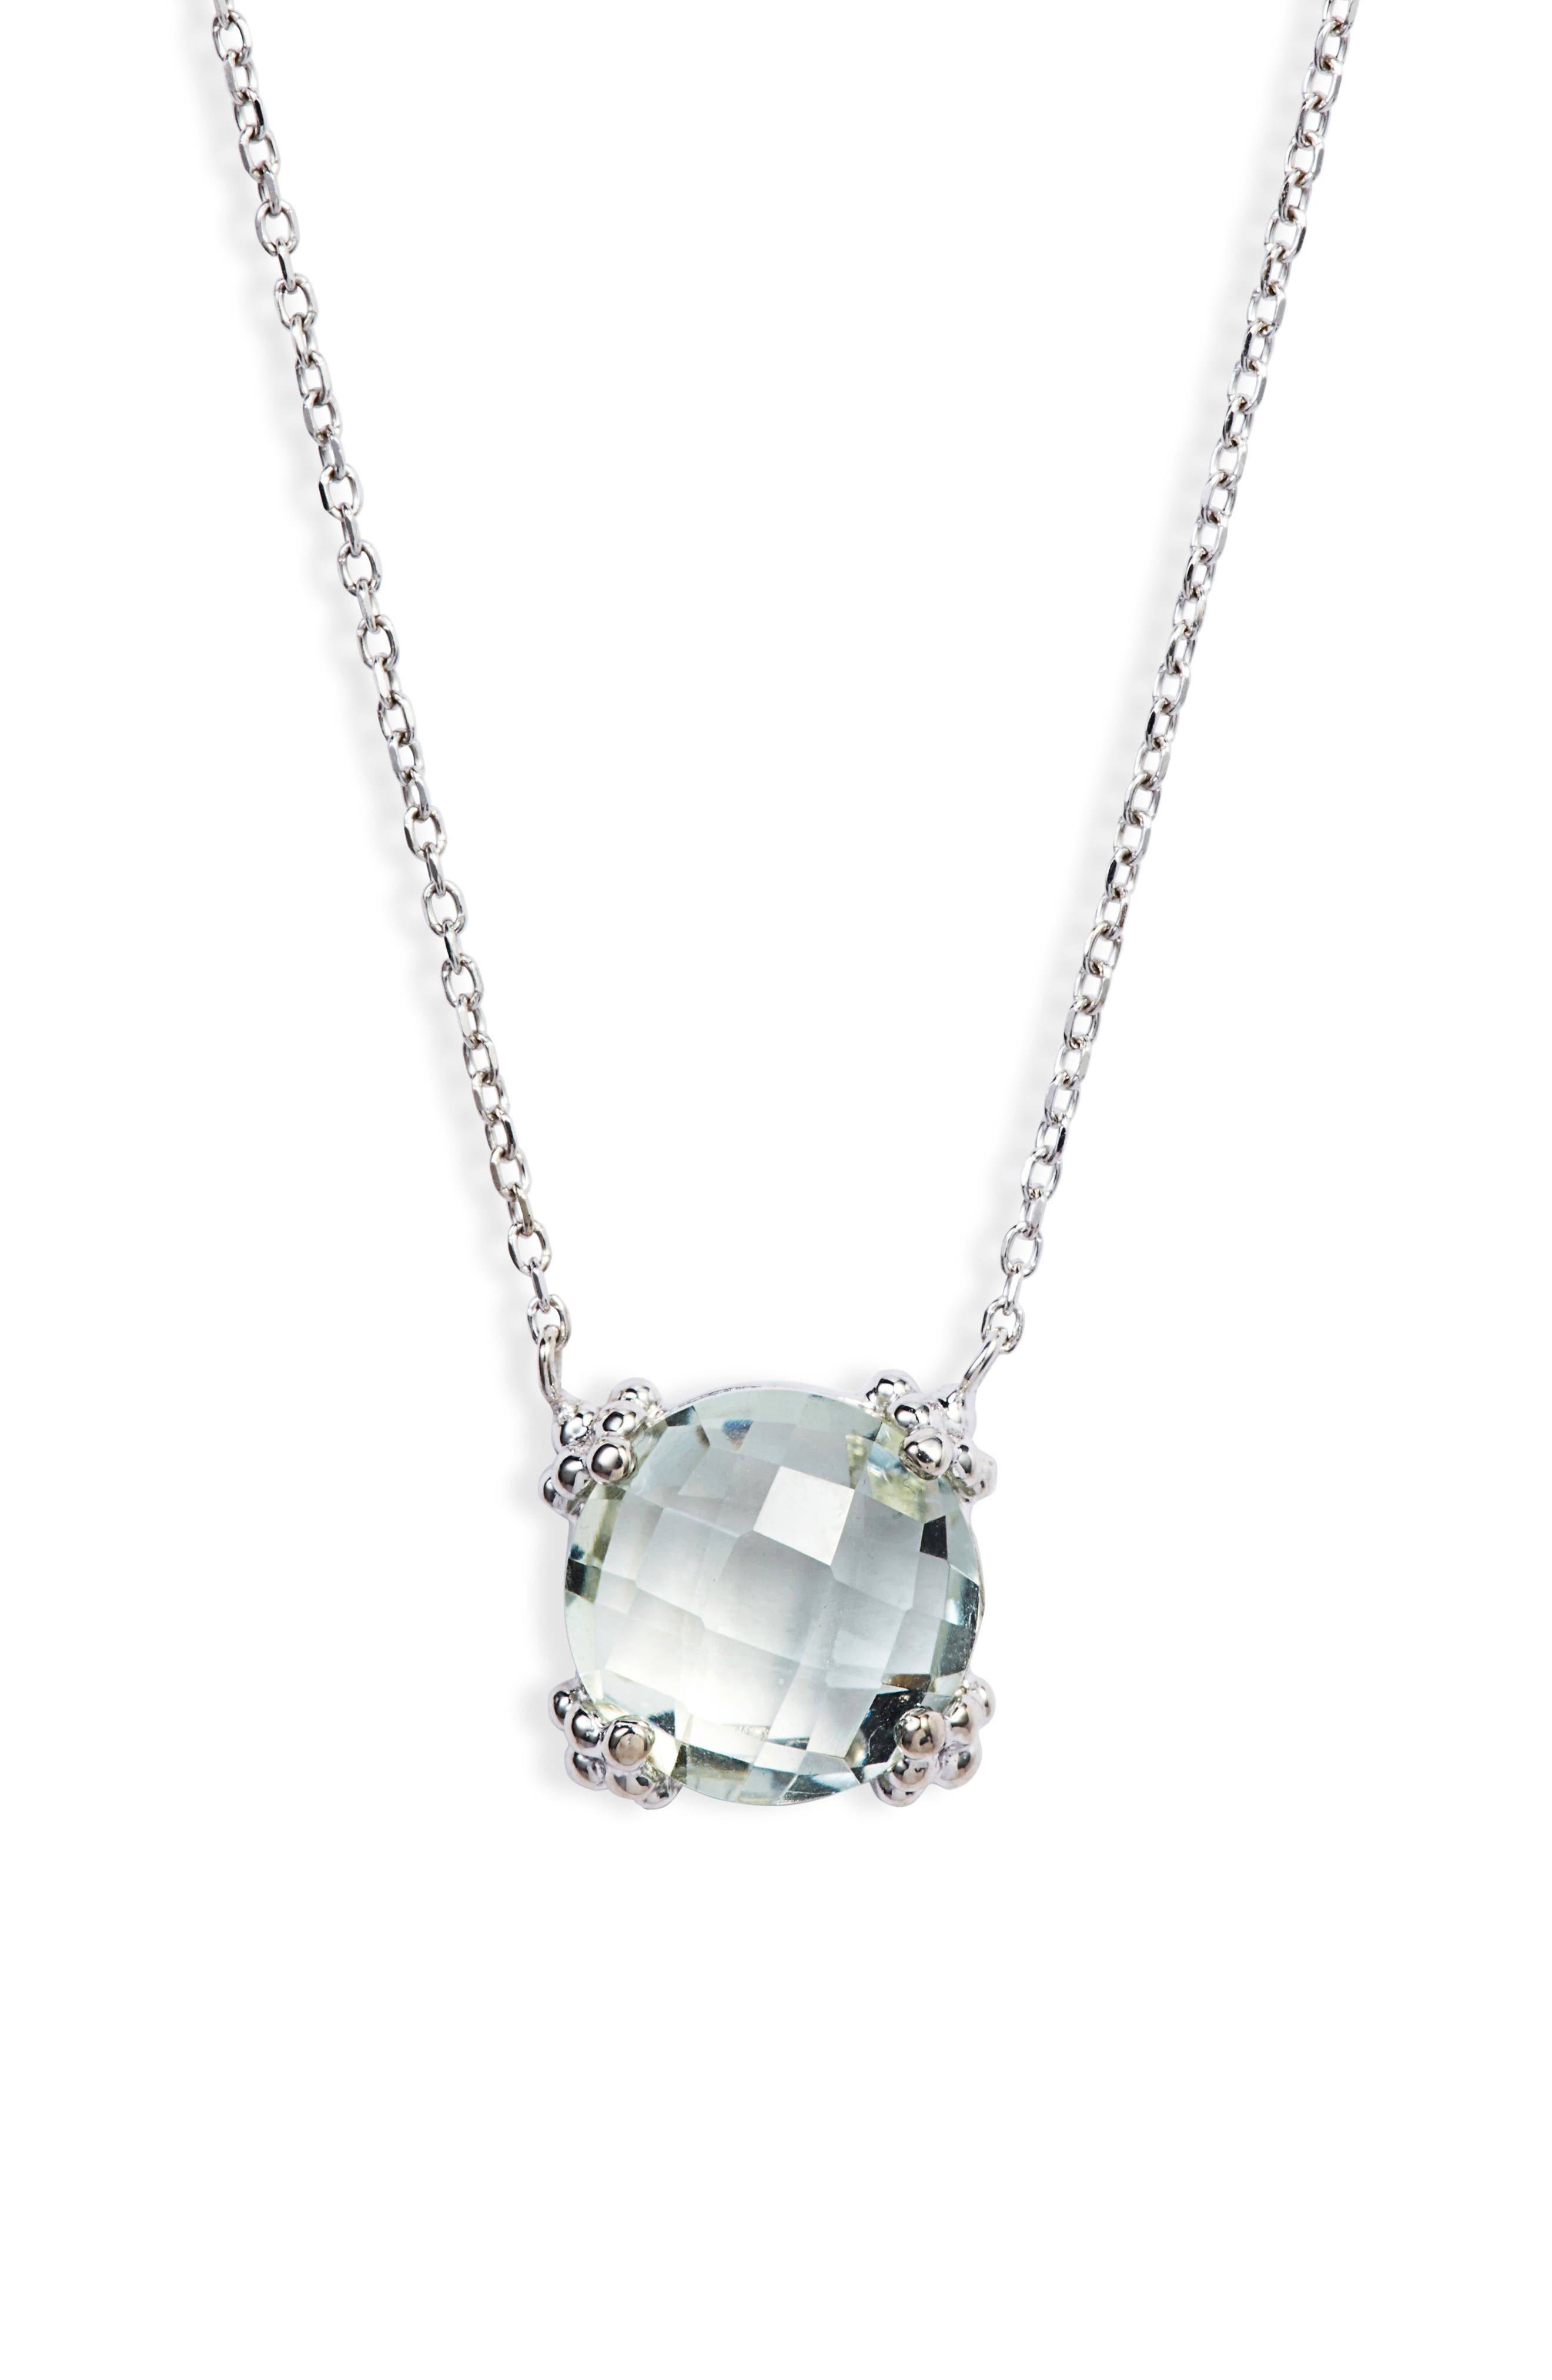 Dew Drop Cluster Topaz Pendant Necklace,                         Main,                         color, GREEN AMETHYST